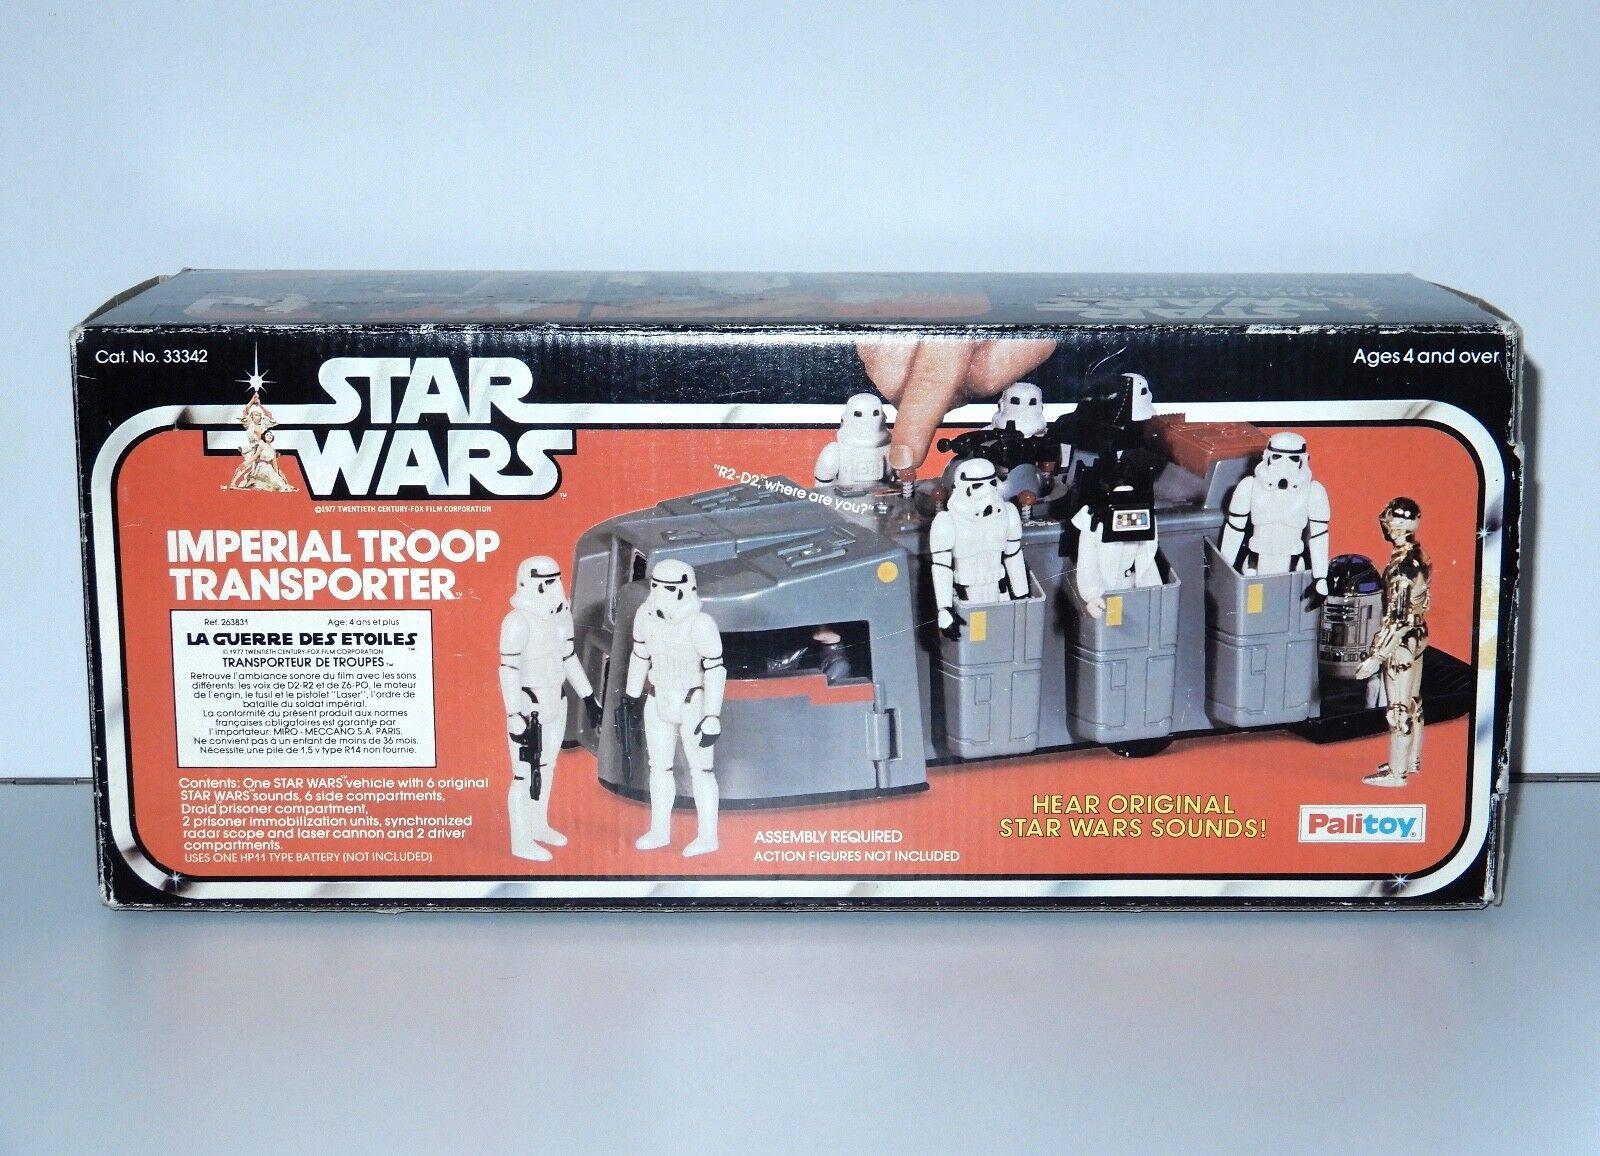 STAR WARS KENNER 1978 ANH IMPERIAL TROOP TRANSPORTER IN ORIGINAL BOX grau COVER